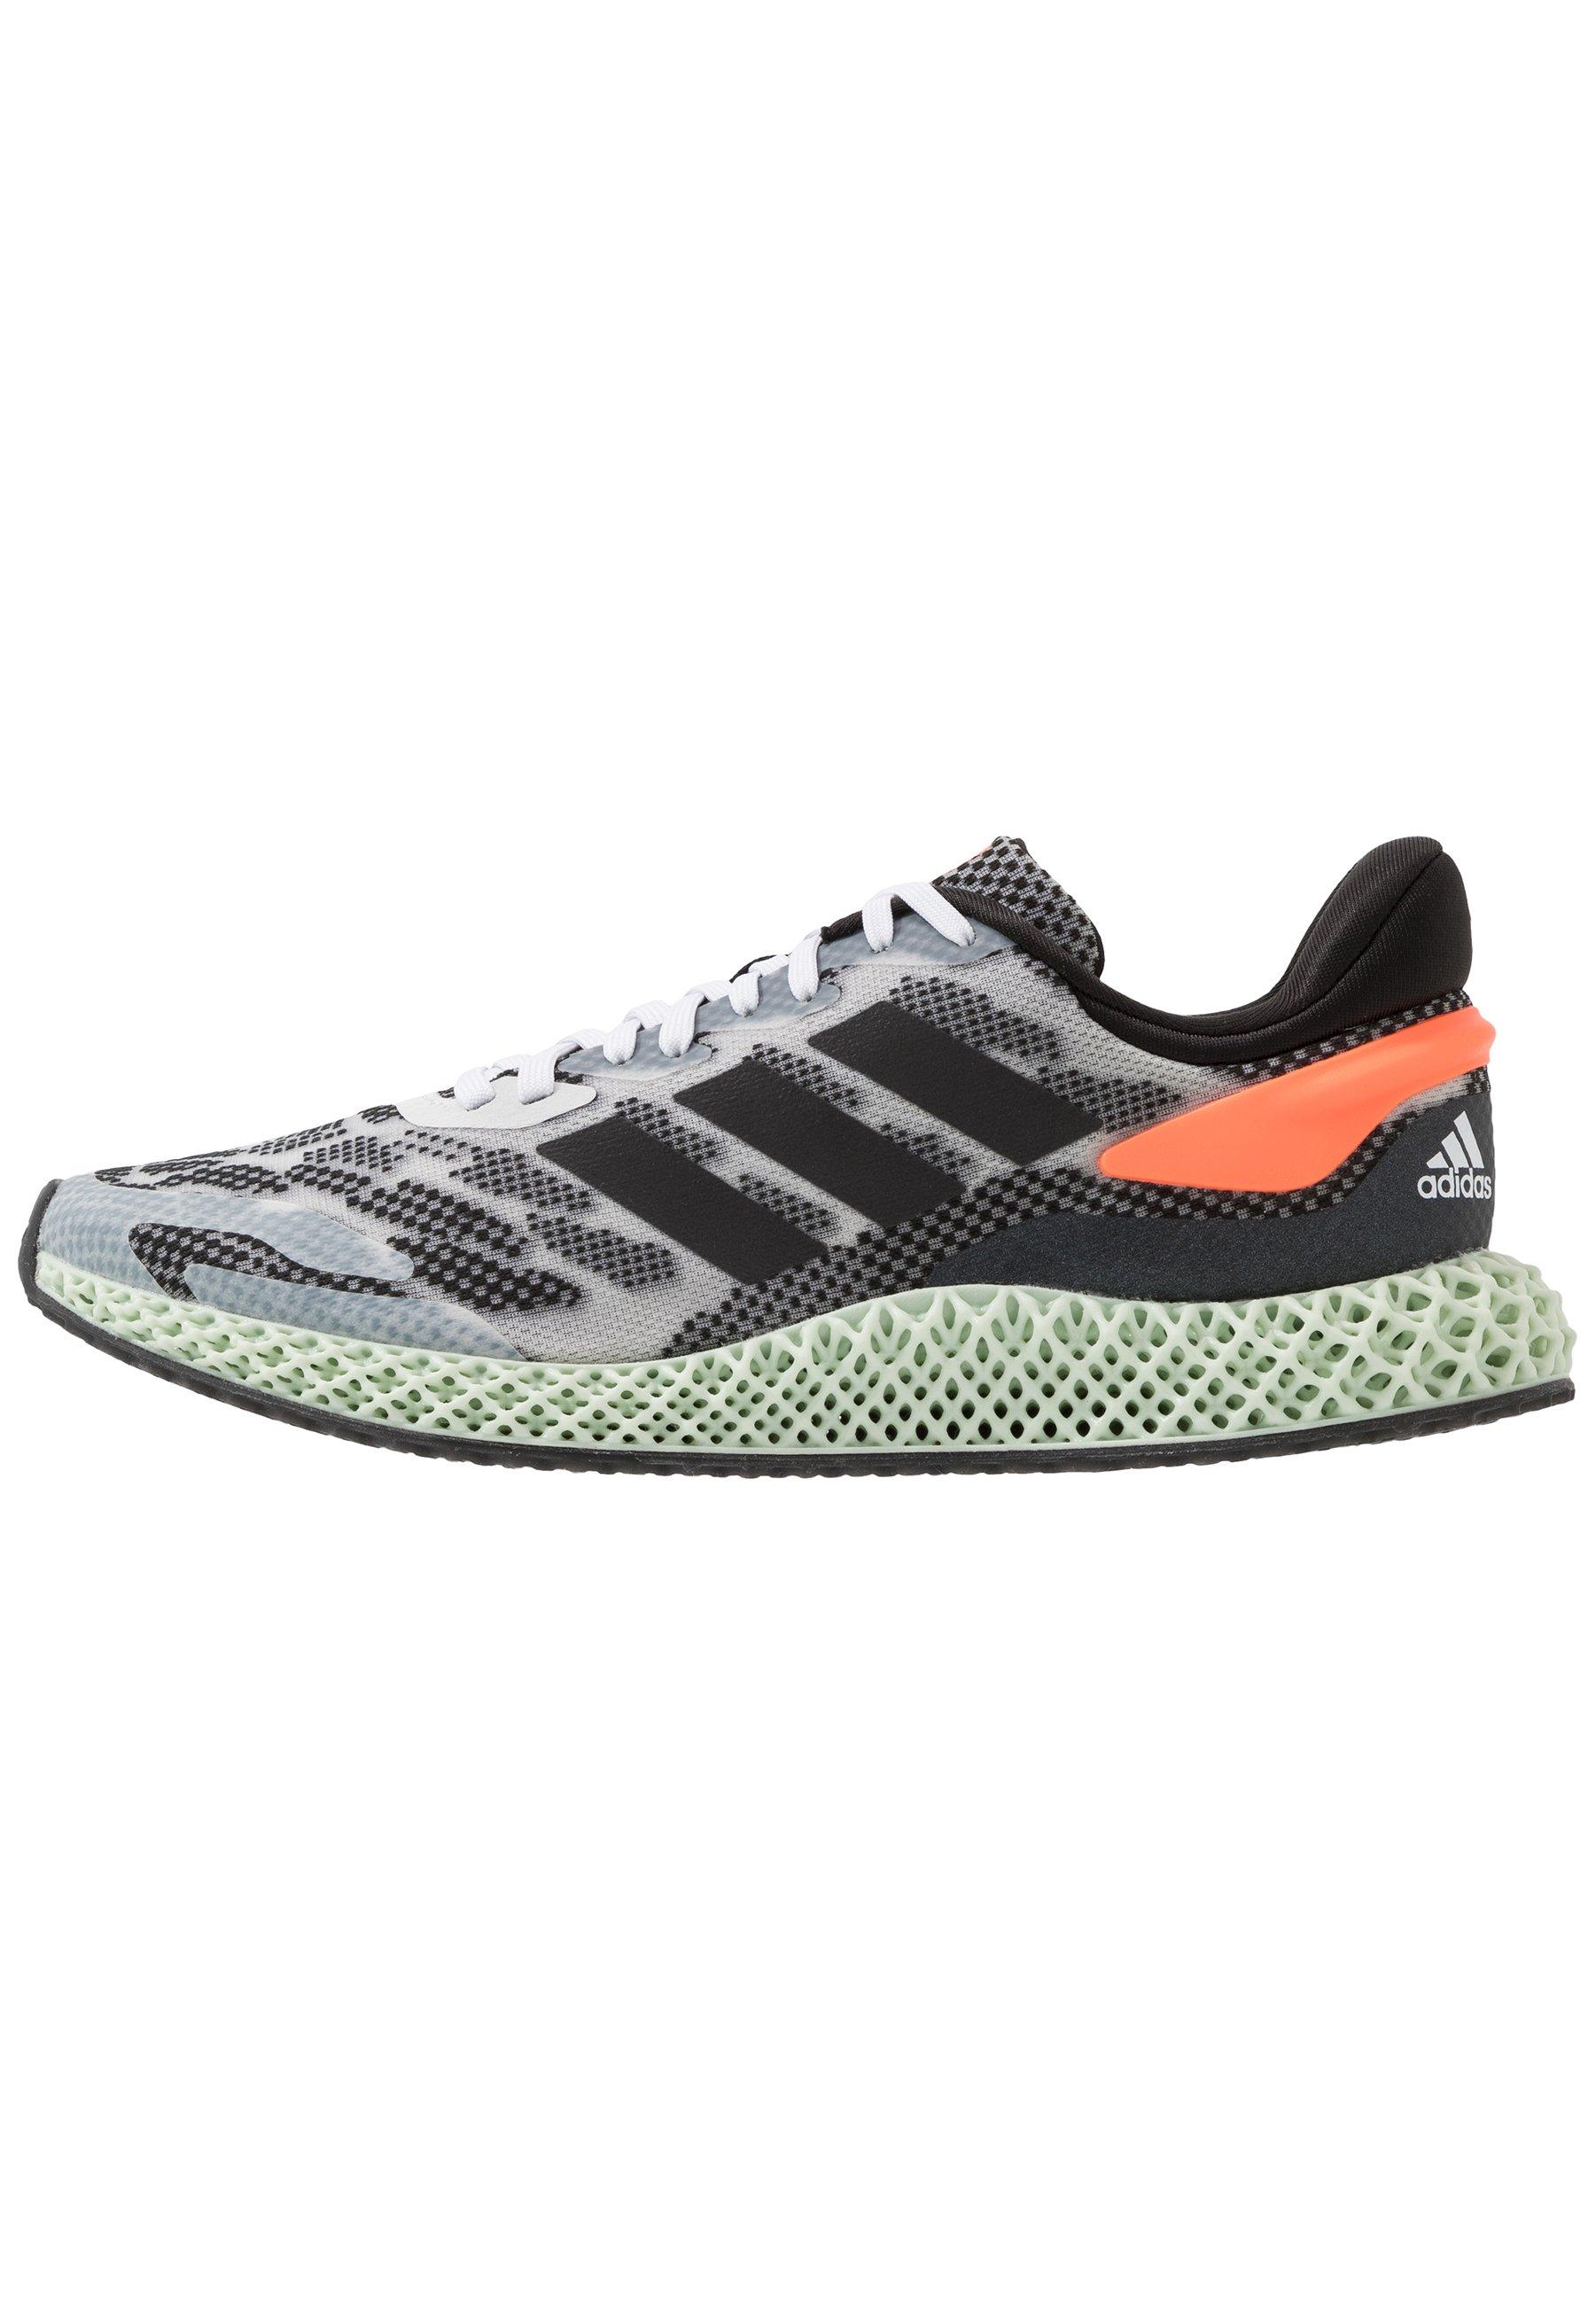 4D 1.0 Laufschuh Neutral footwear whitecore blacksignal coral